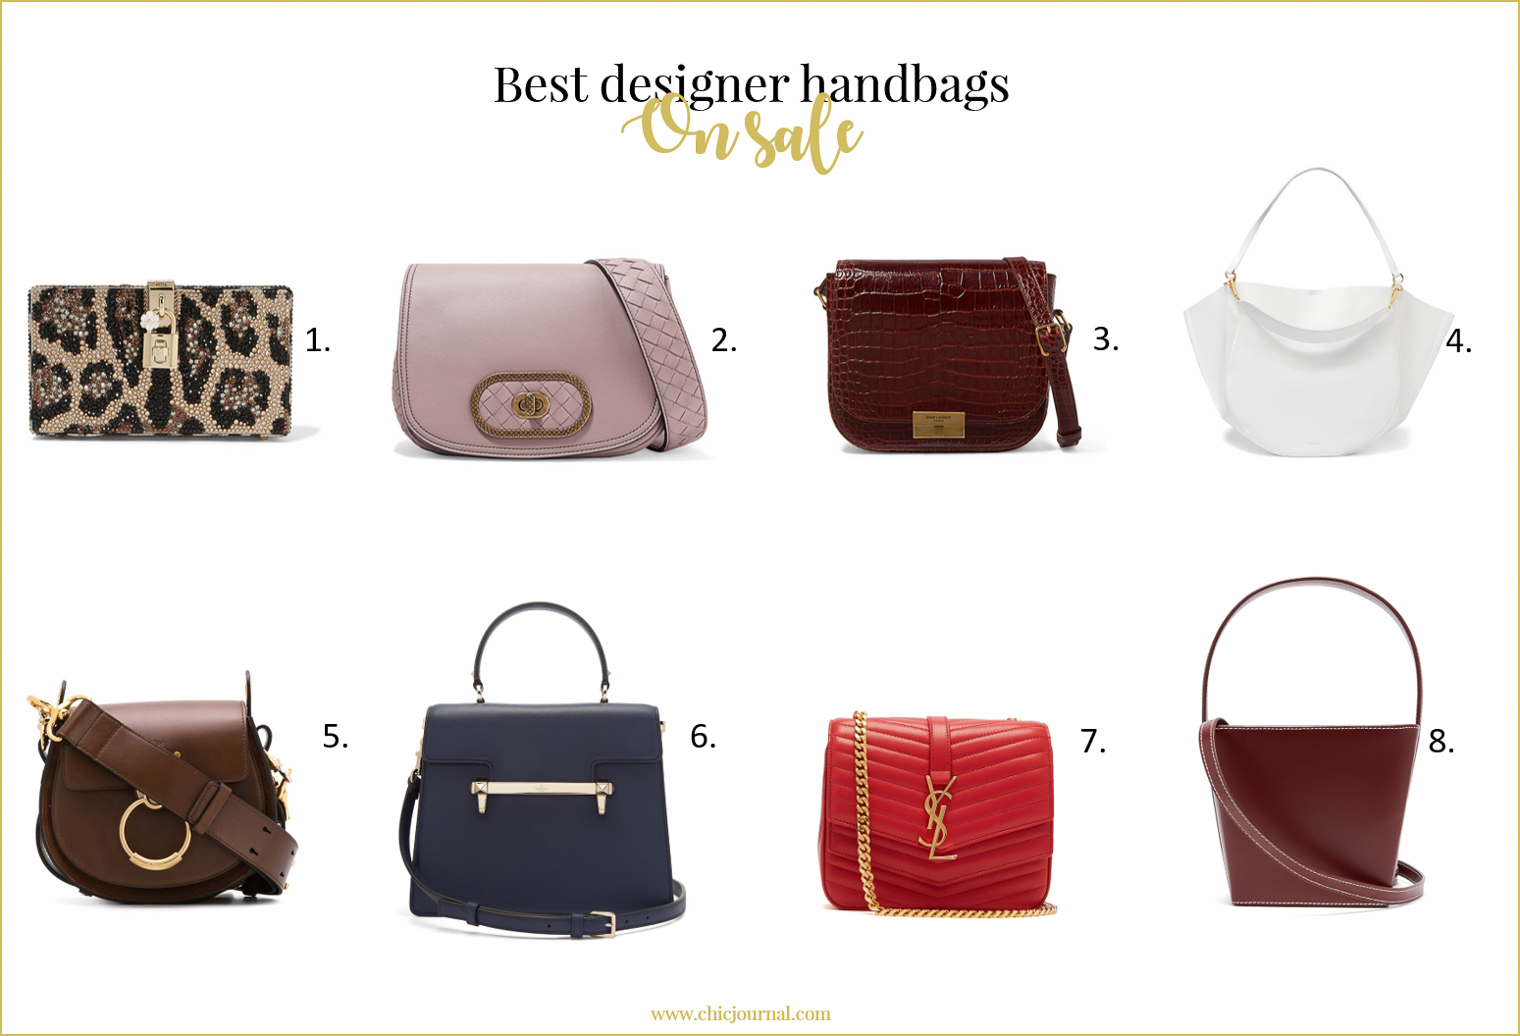 Best designer handbags in summer sales